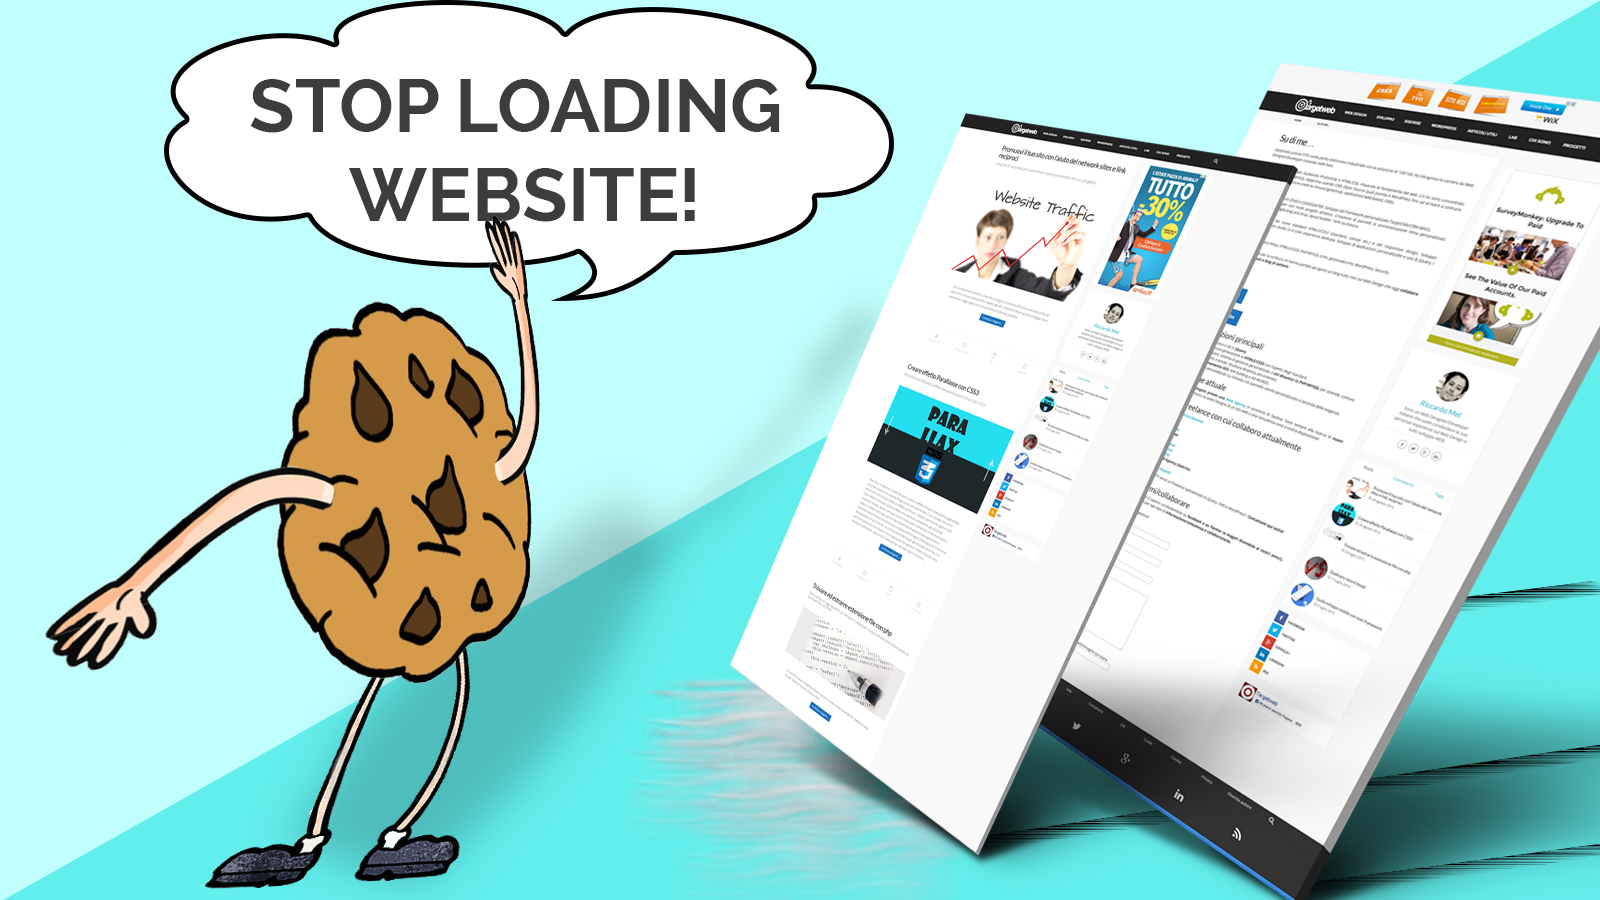 Cookie Policy: Bloccare Caricamento Pagina Per Cookie Policy